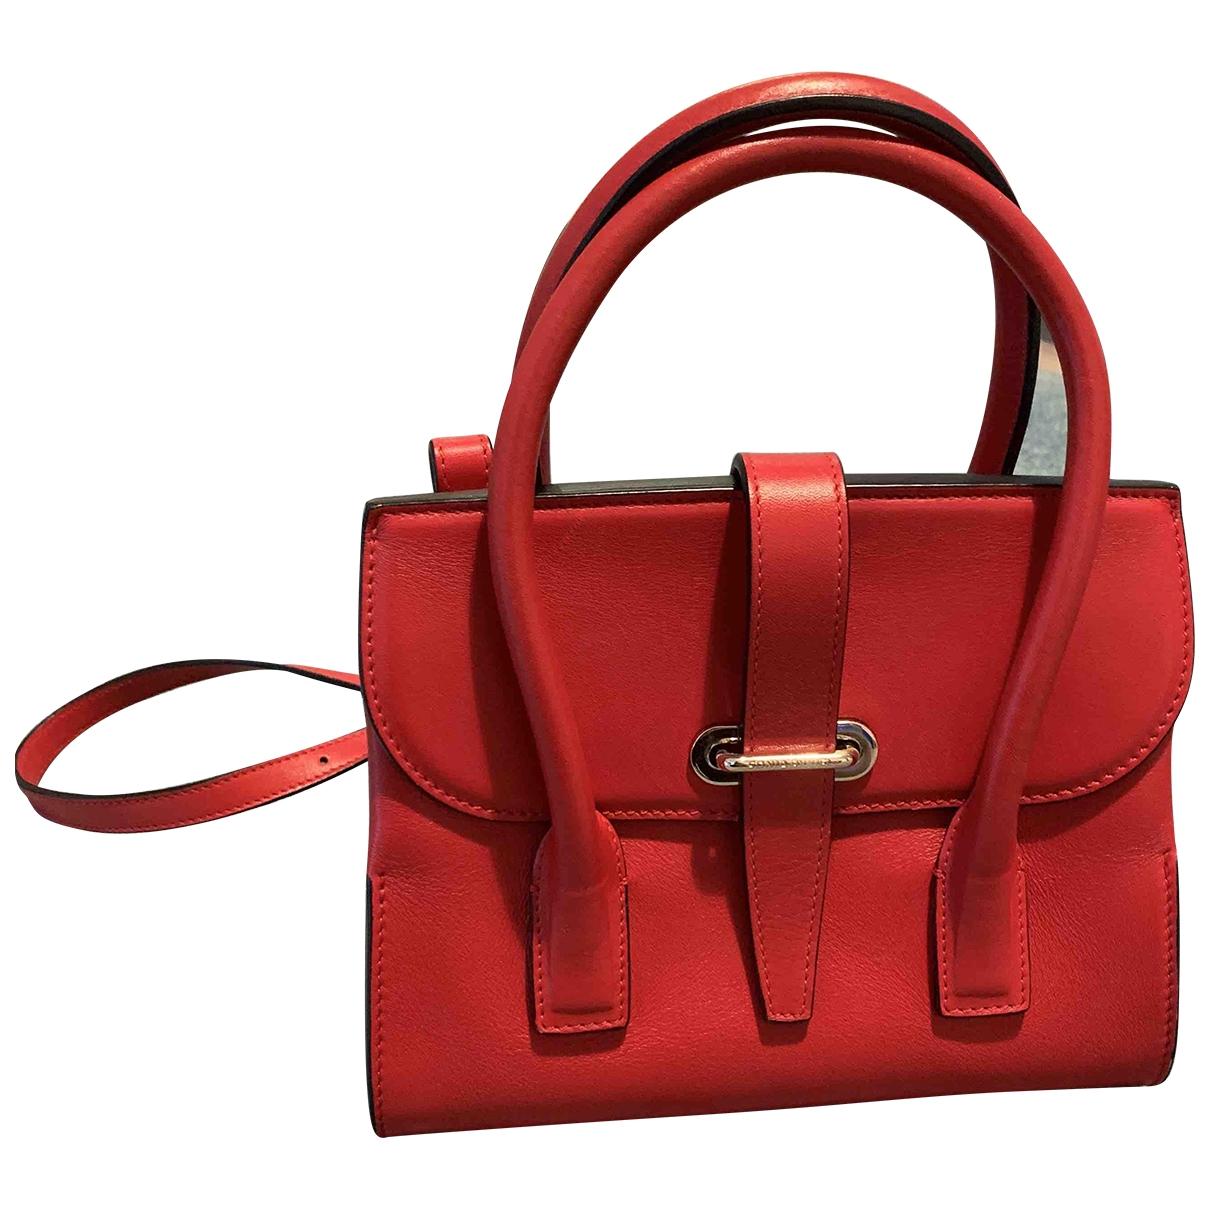 Sonia Rykiel \N Handtasche in  Rot Leder